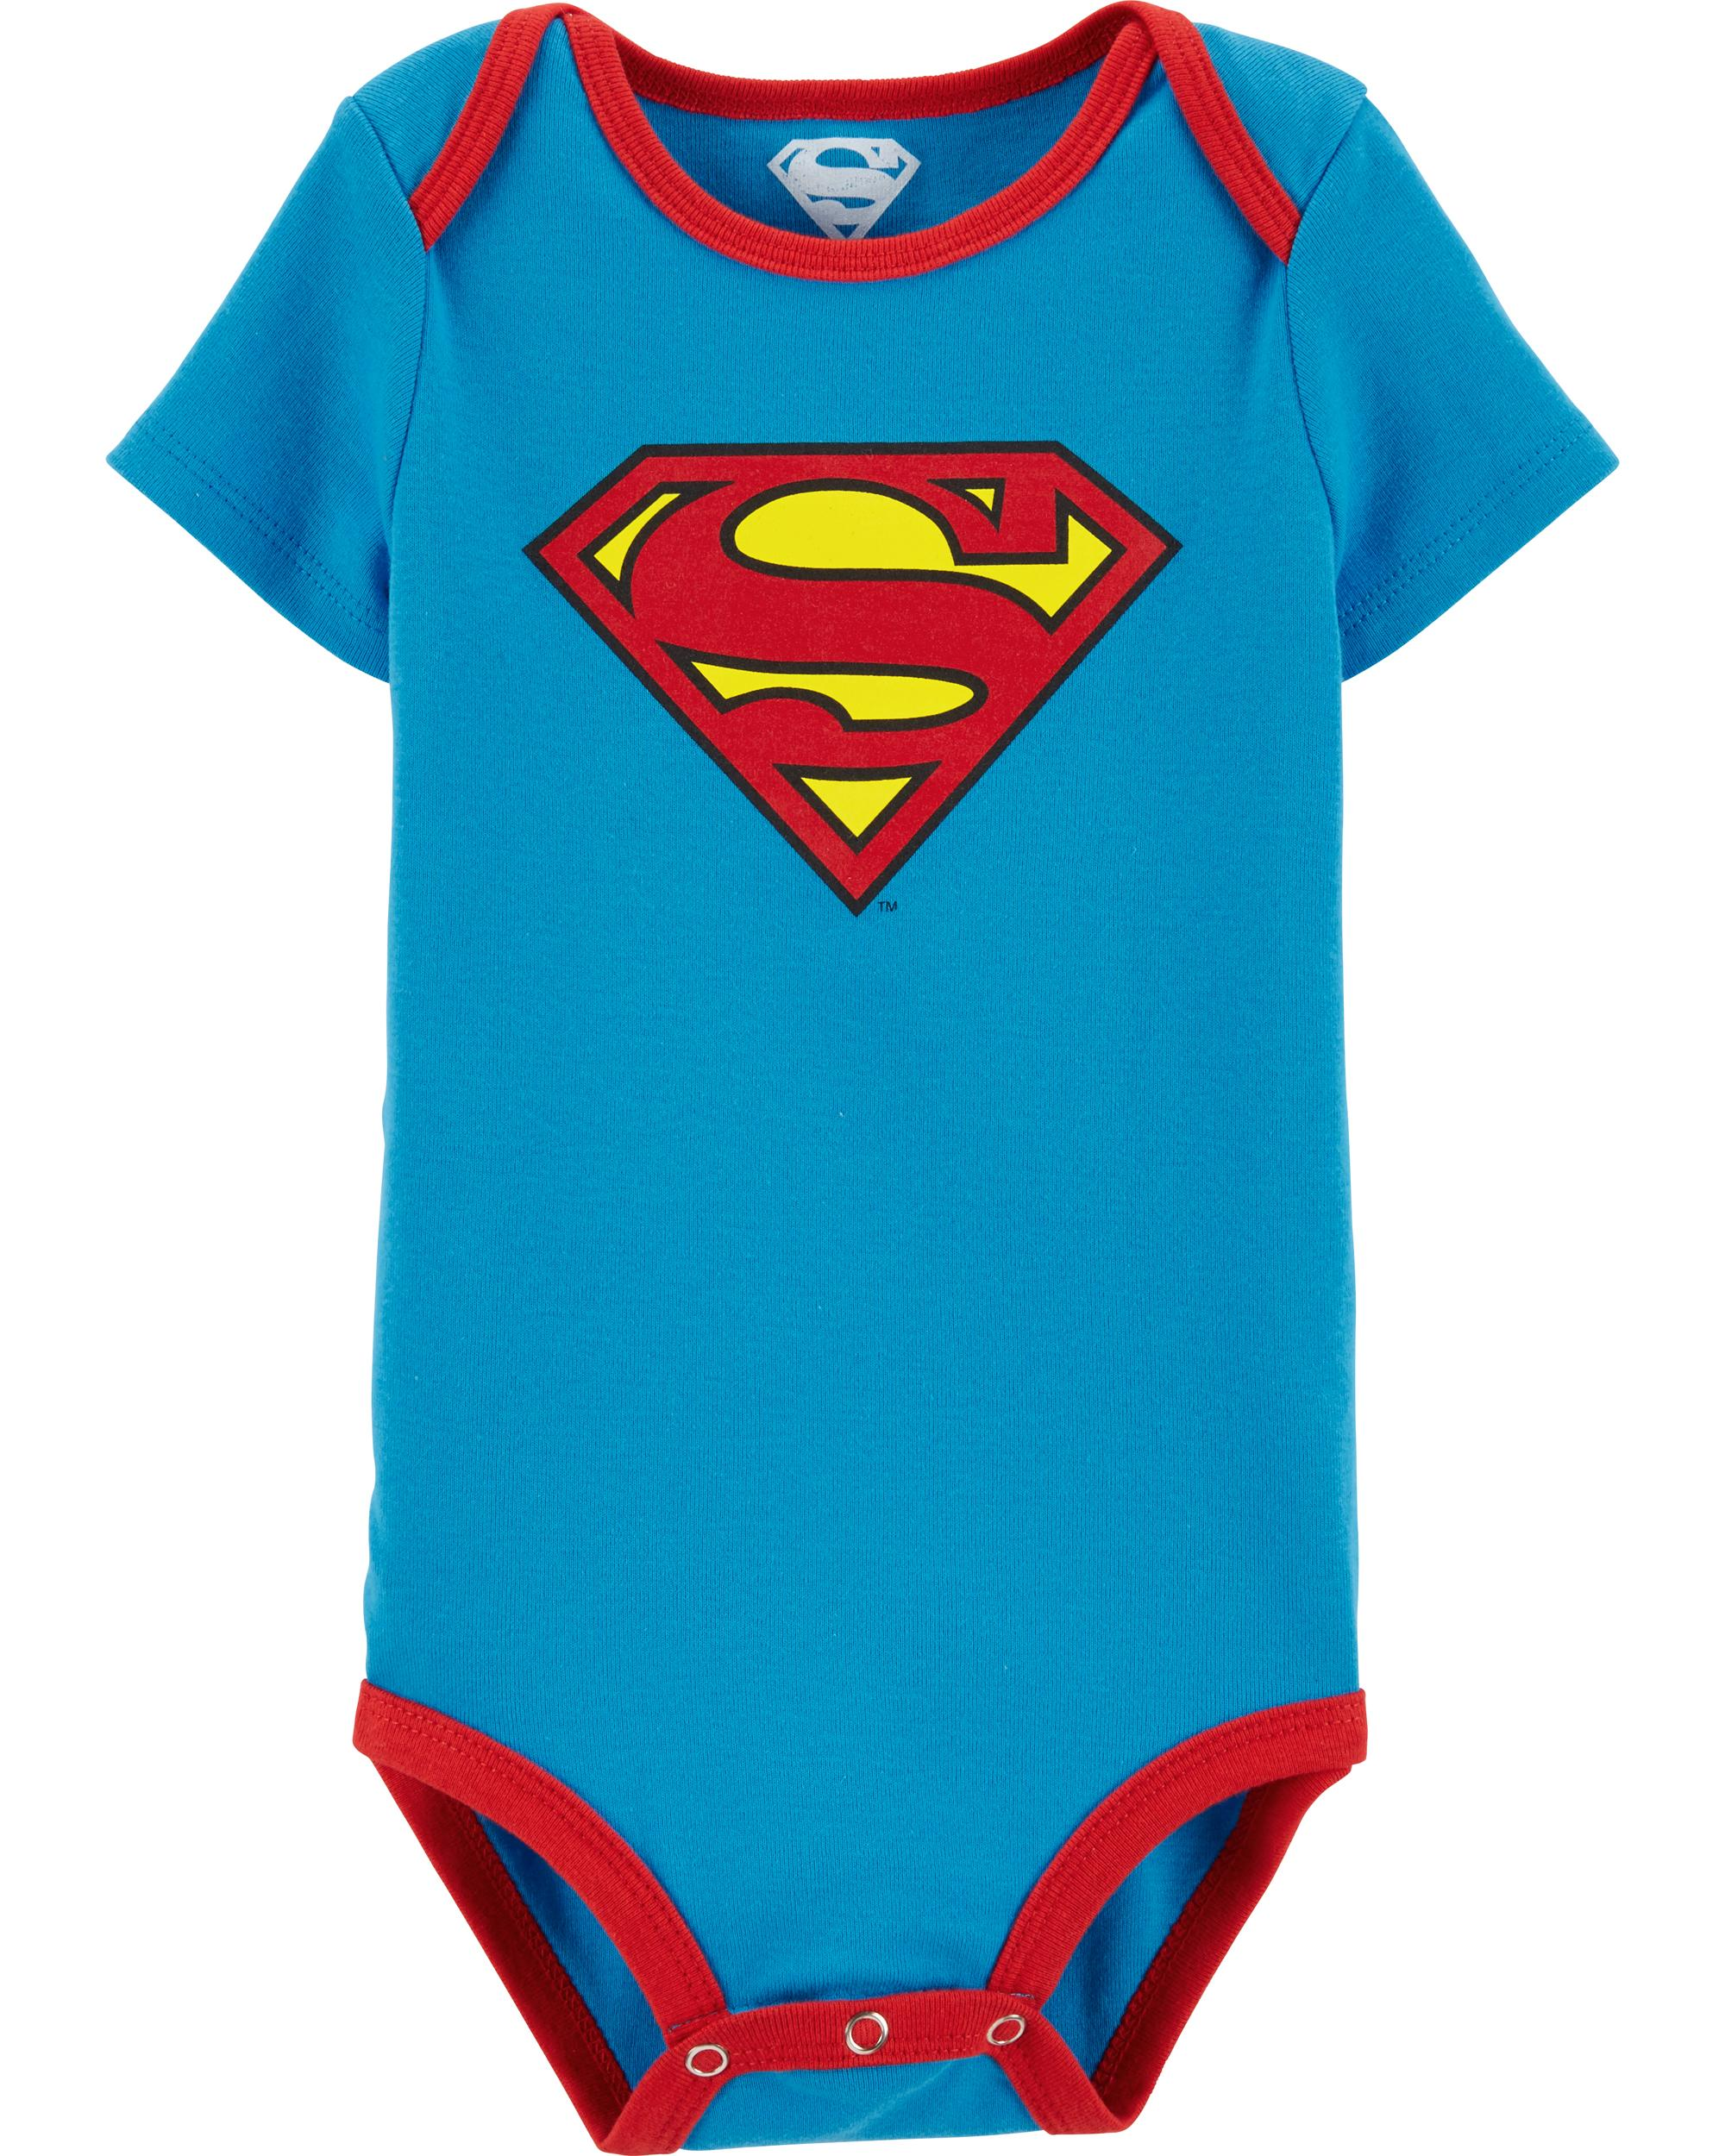 88b71b61 Superman Bodysuit | oshkosh.com